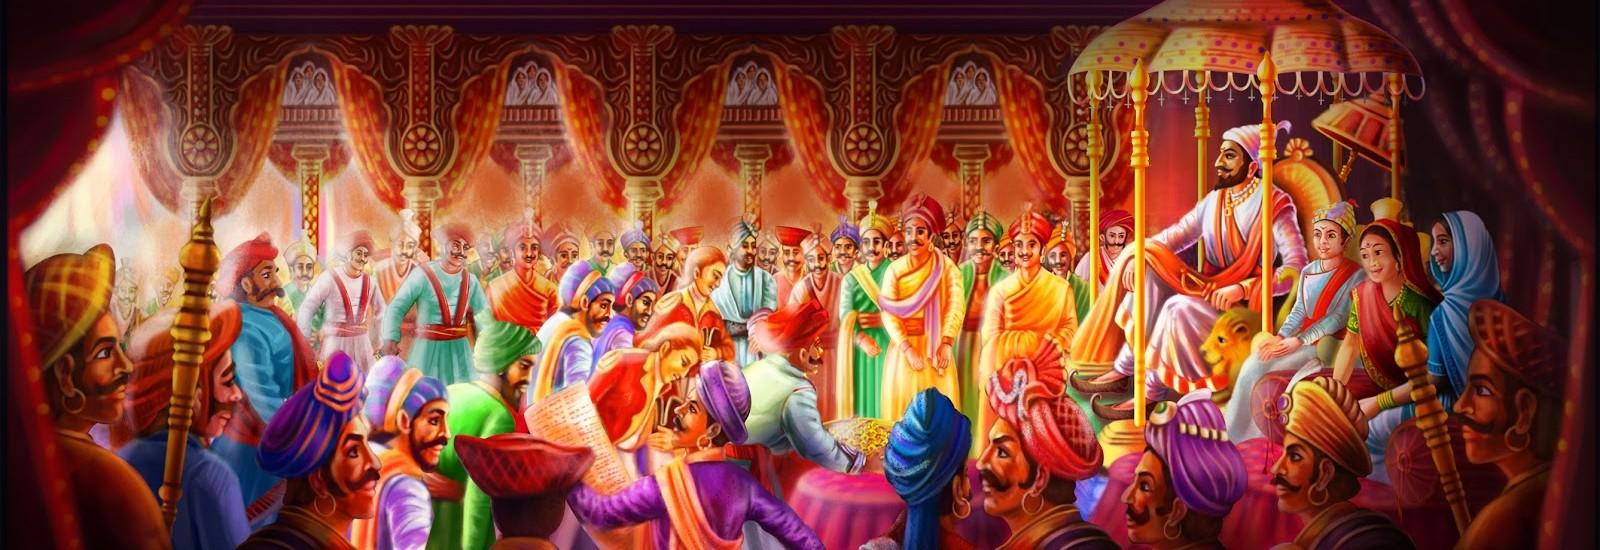 Shivaji Raje 3d Wallpaper Shivcharitra By Babasaheb Purandare Shivaji Maharaj